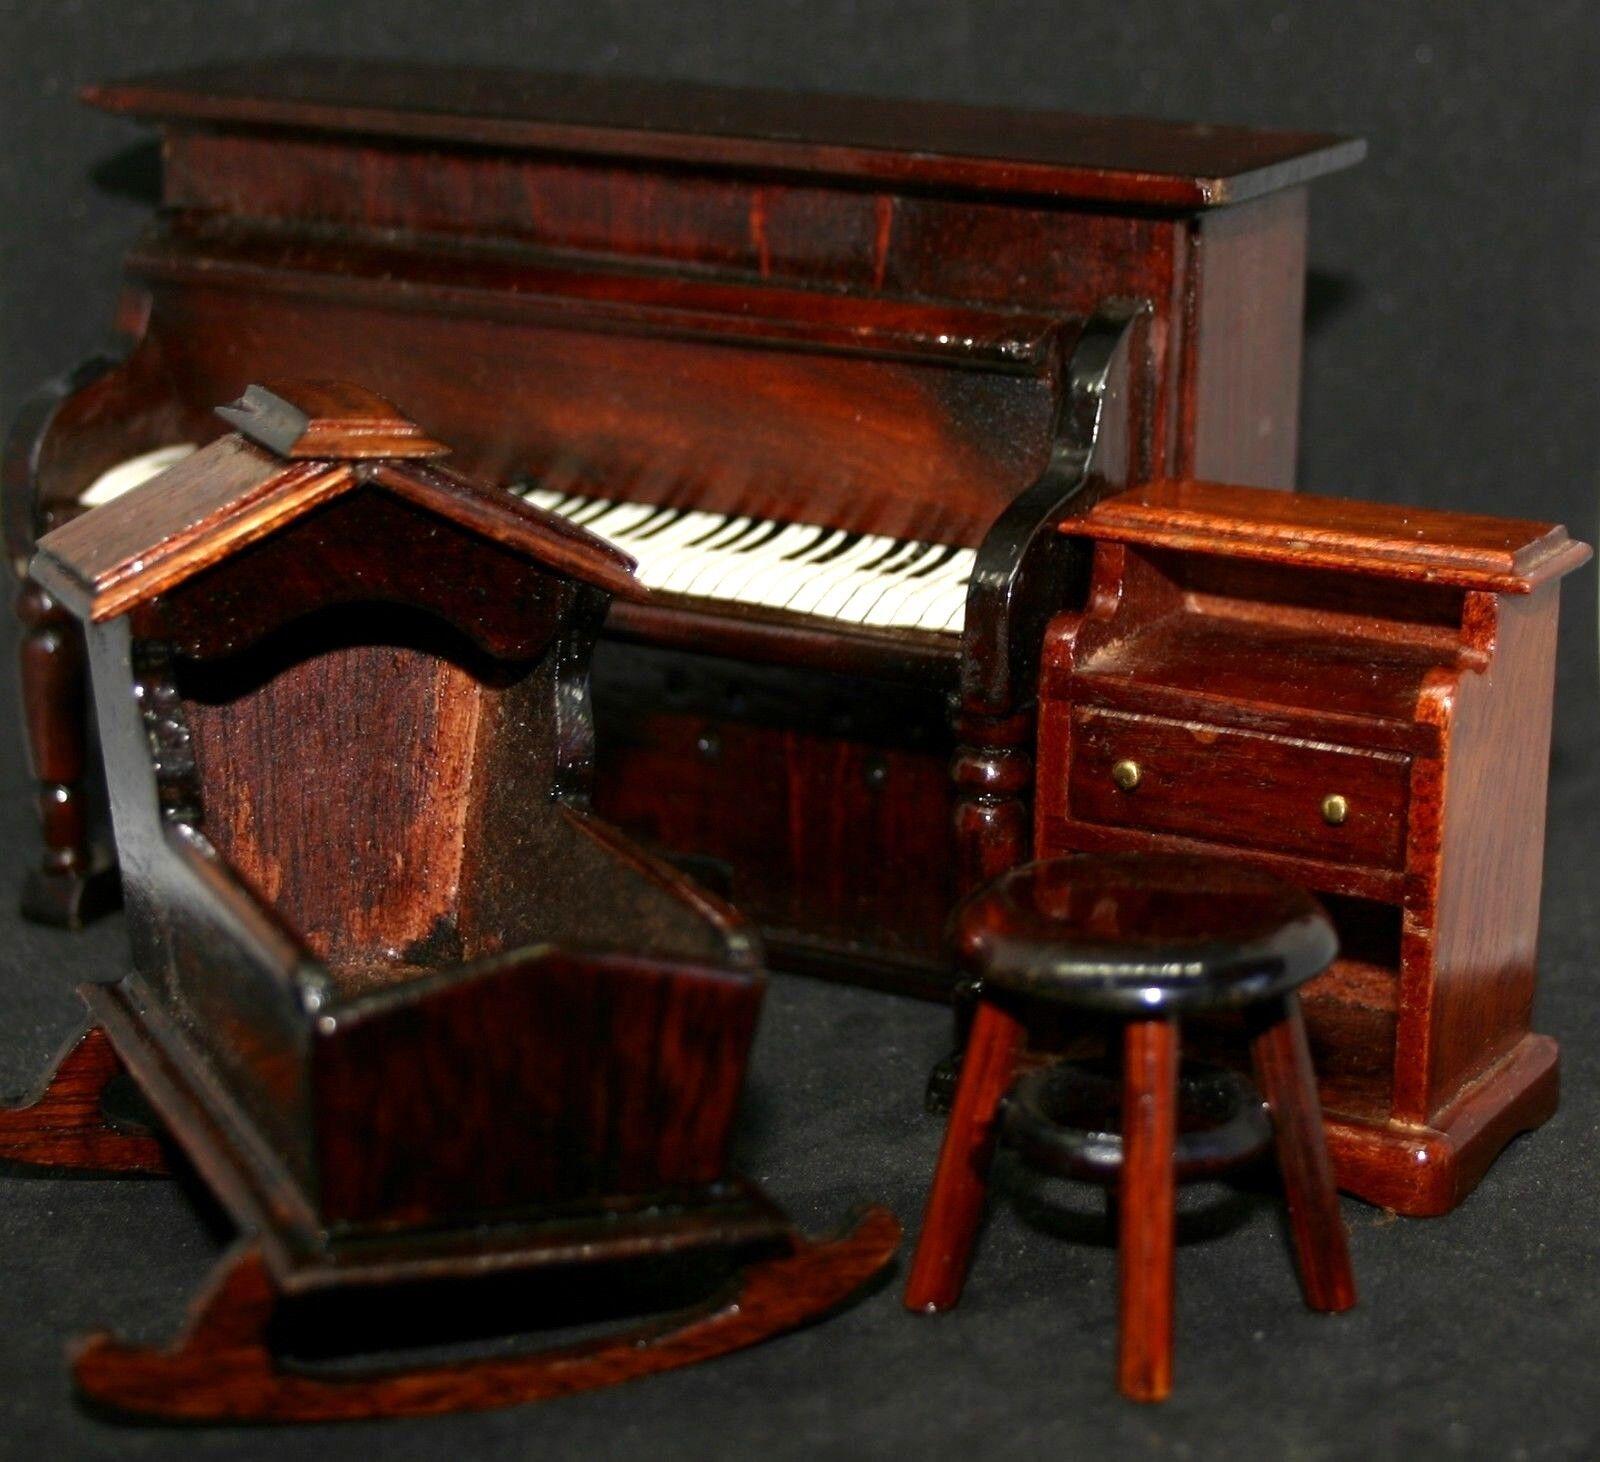 Bespoke Handcraft Miniature Wooden Furniture Decorative or Dolls House Rare